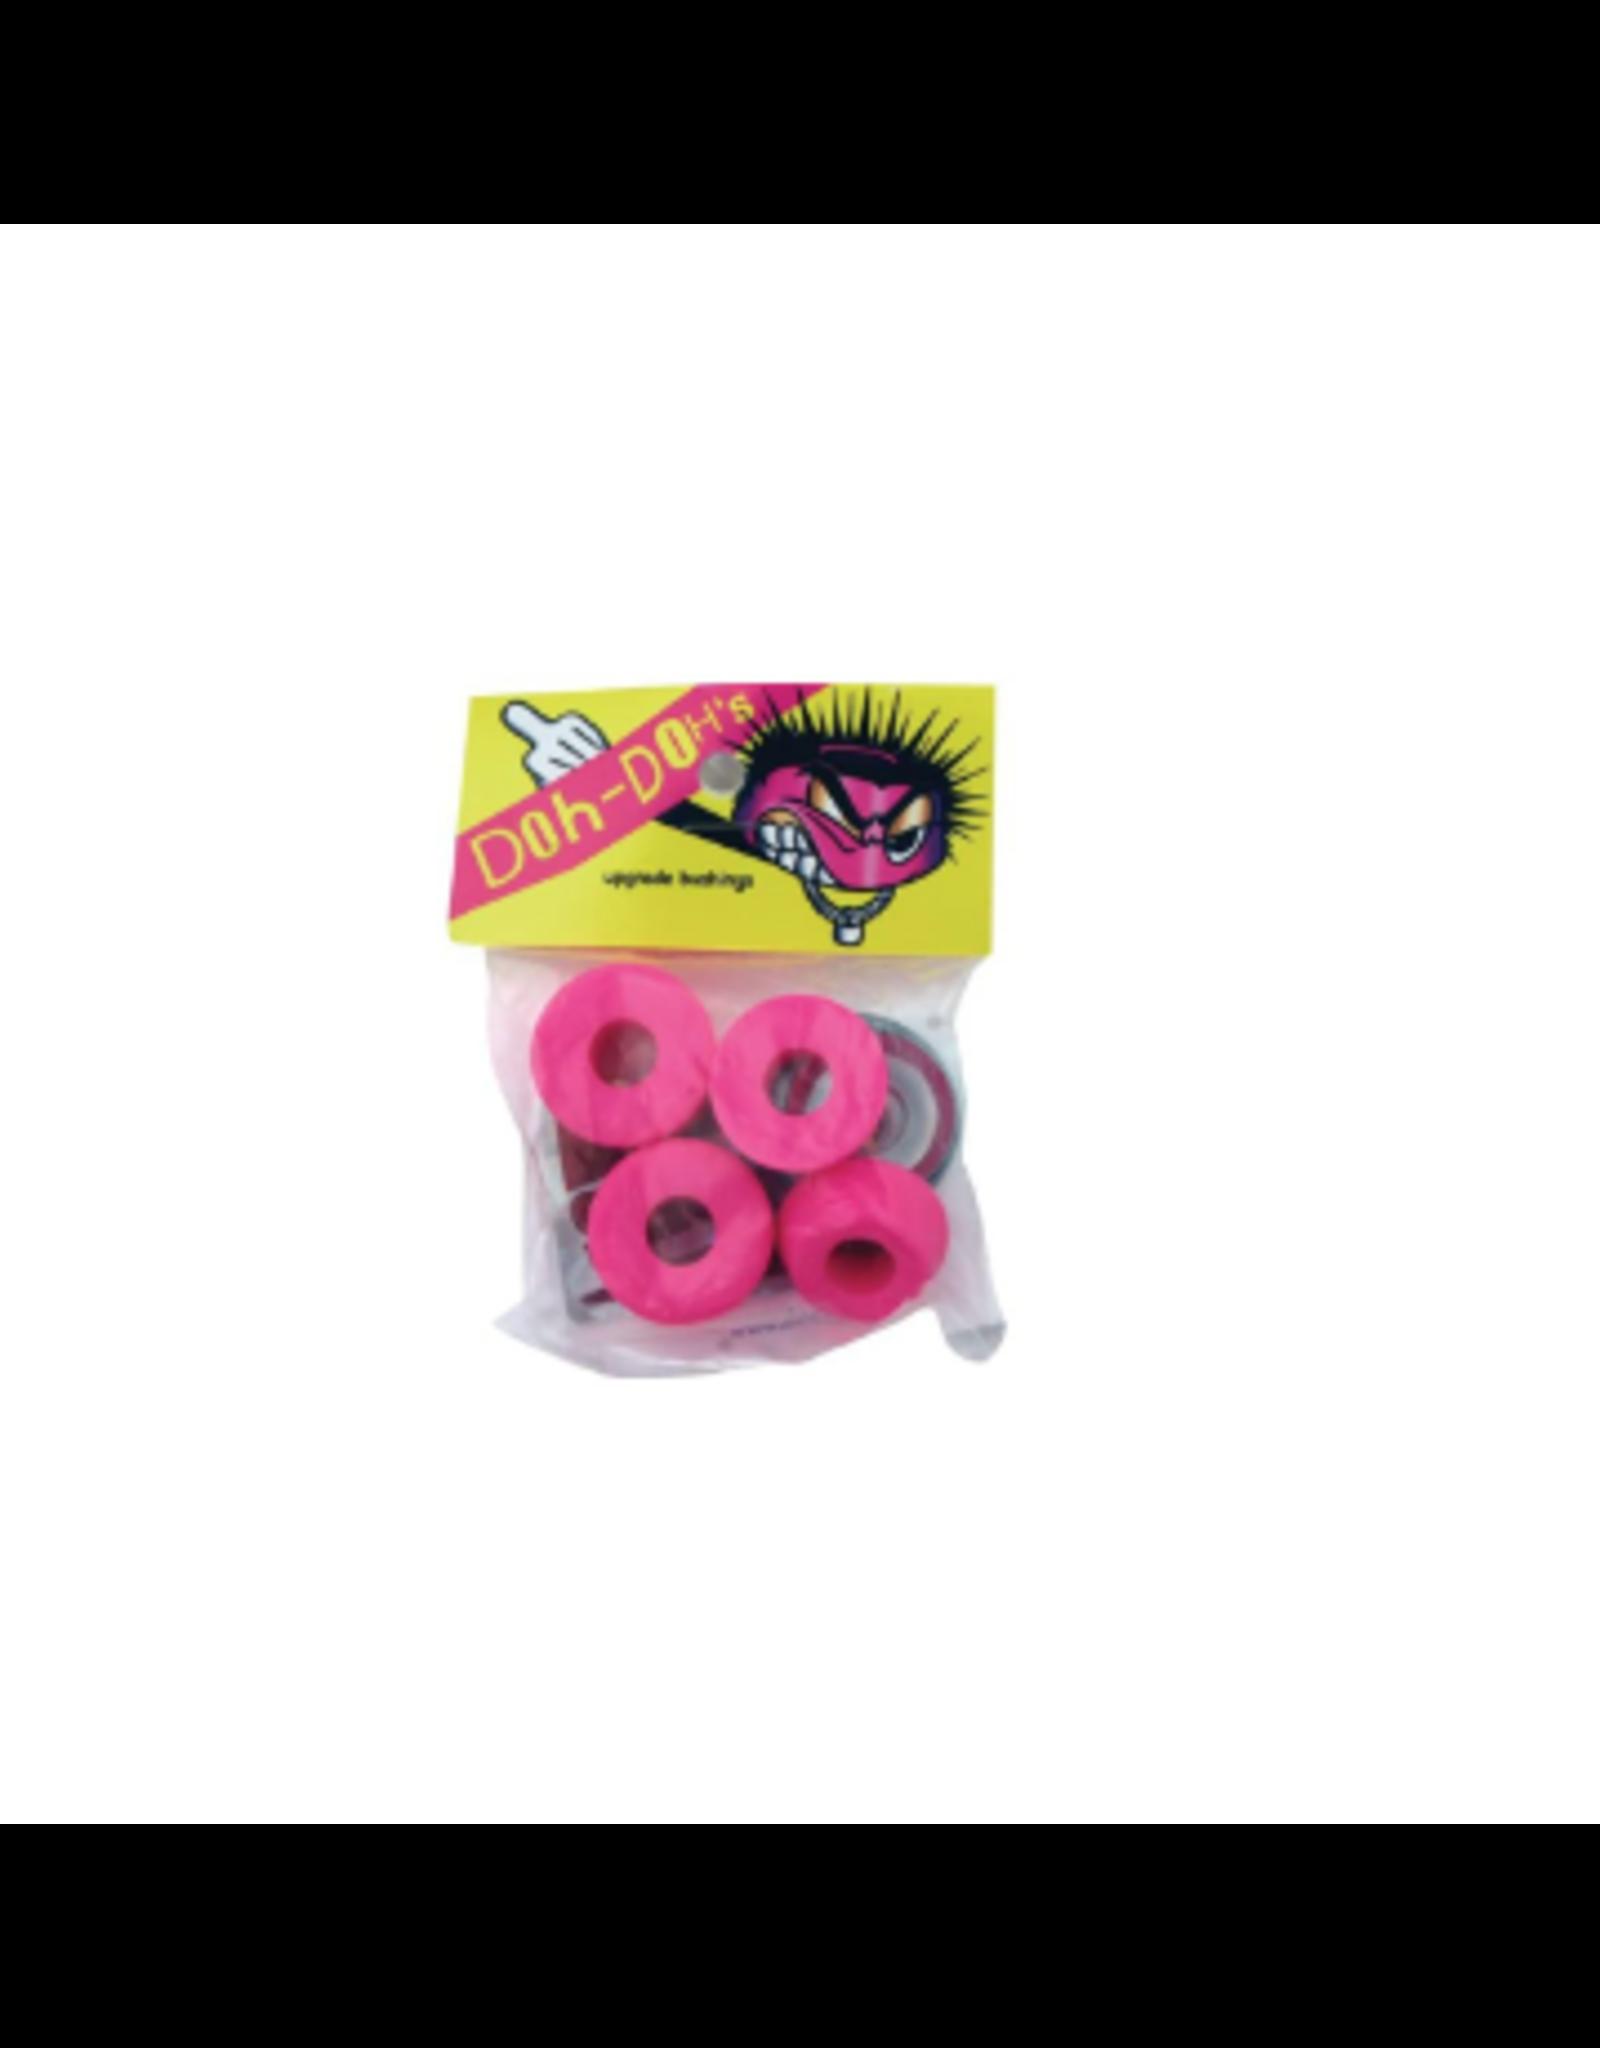 Shorty's Doh-Doh upgrade Kit 99a